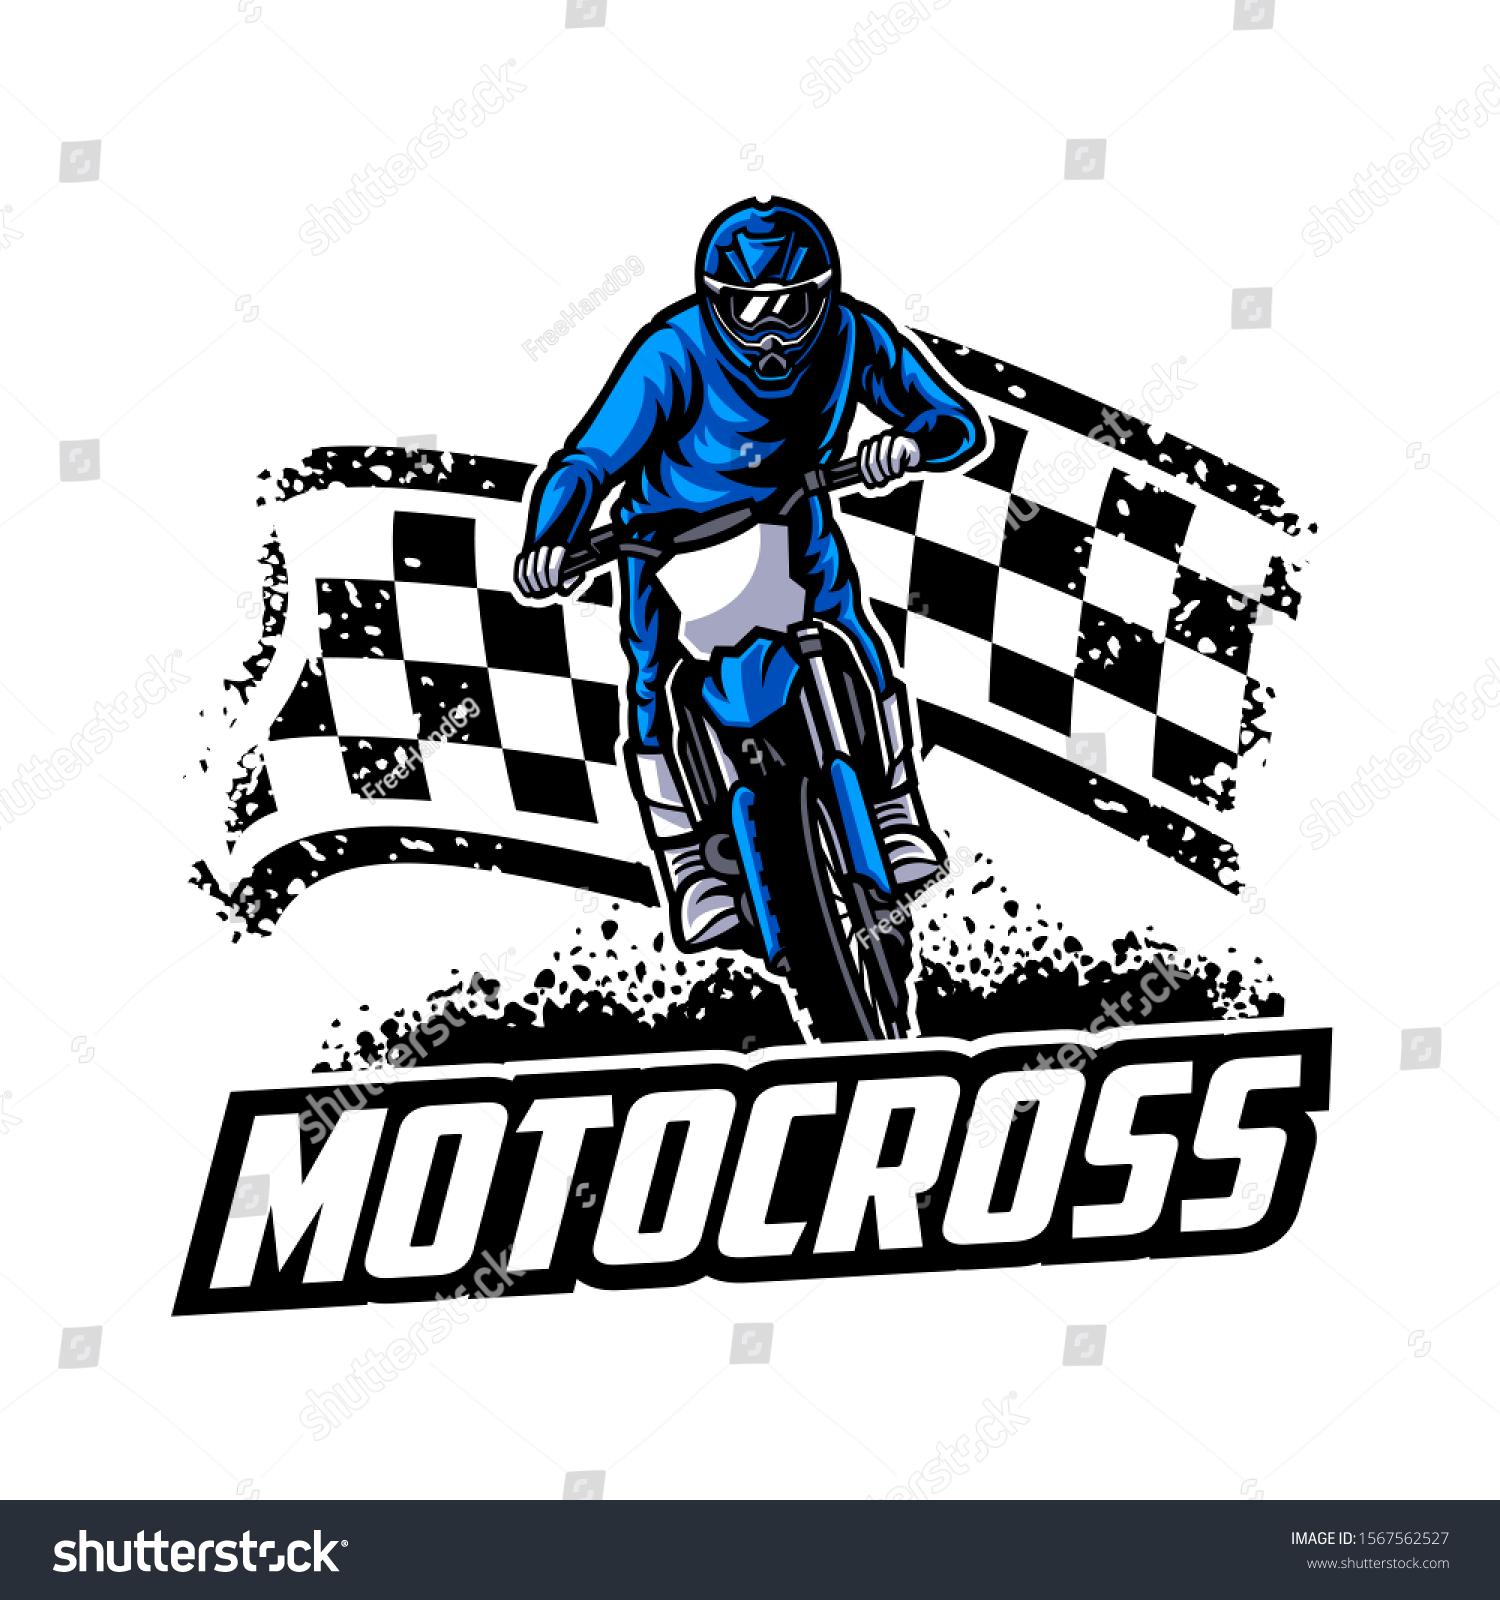 Motocross Vector Logo Illustration Motocross Freestyle Stock Vector Royalty Free 1567562527